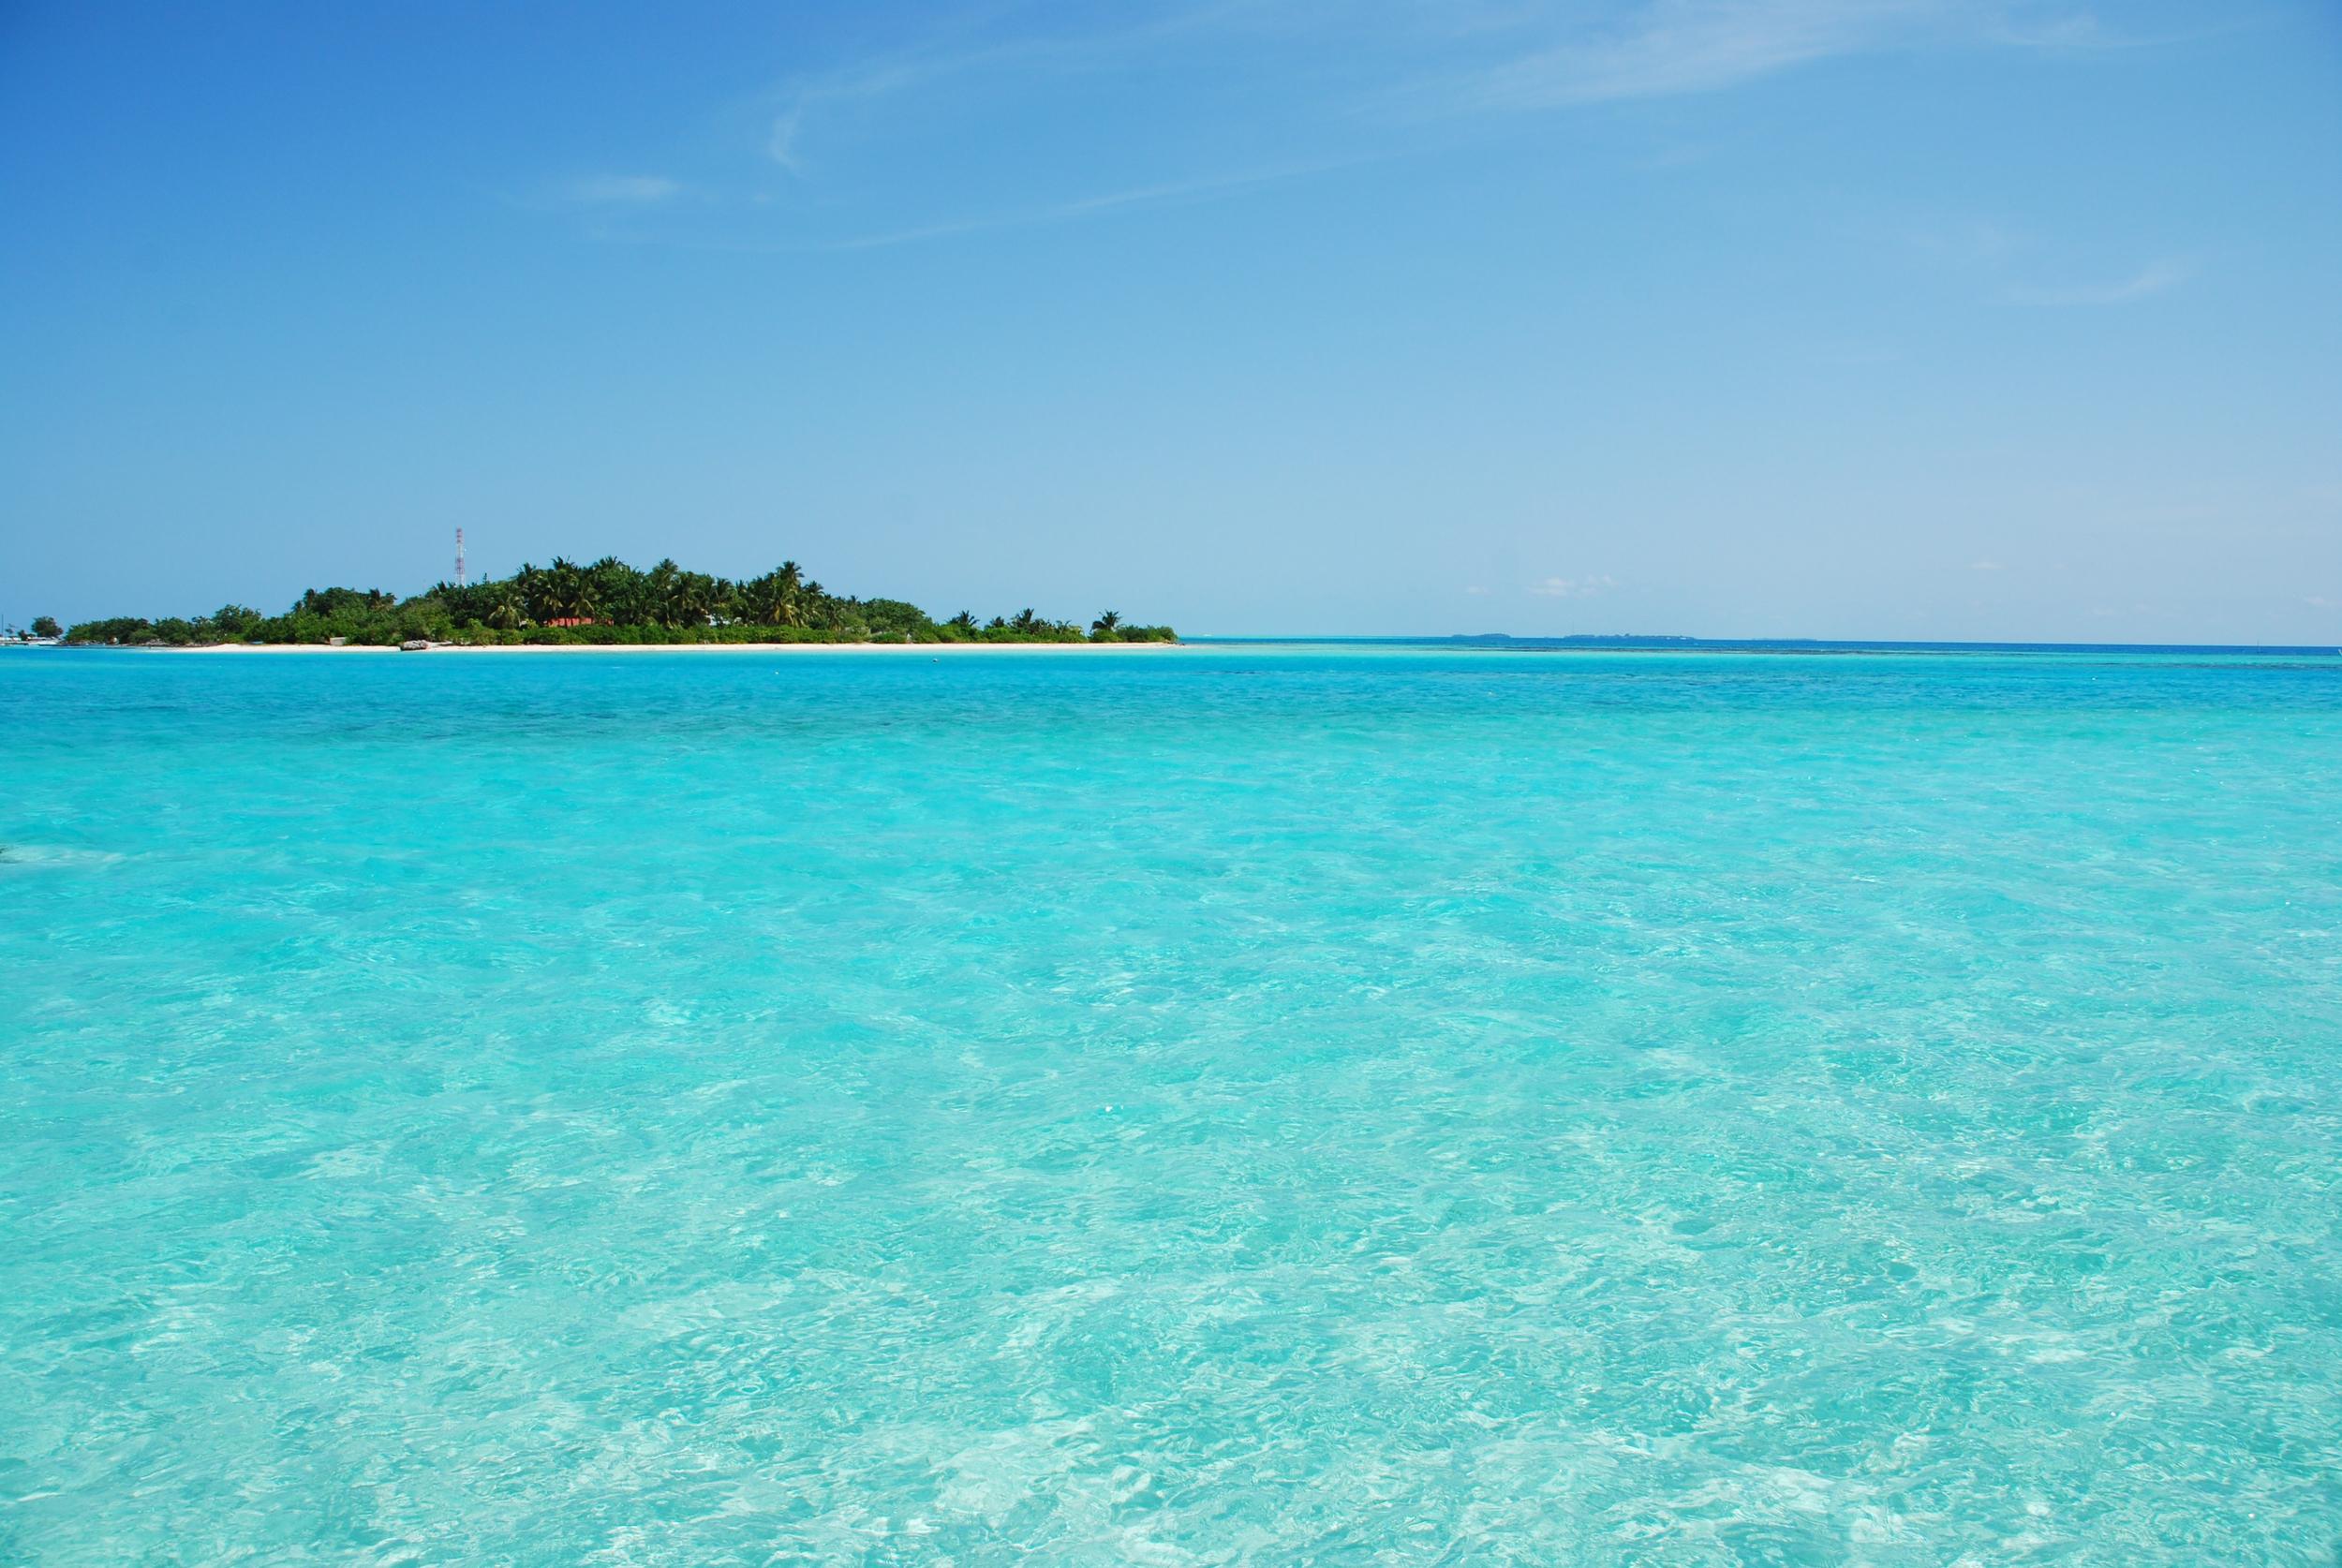 maldives-island-with-gorgeous-turquoise-water_7kIyX4.jpg